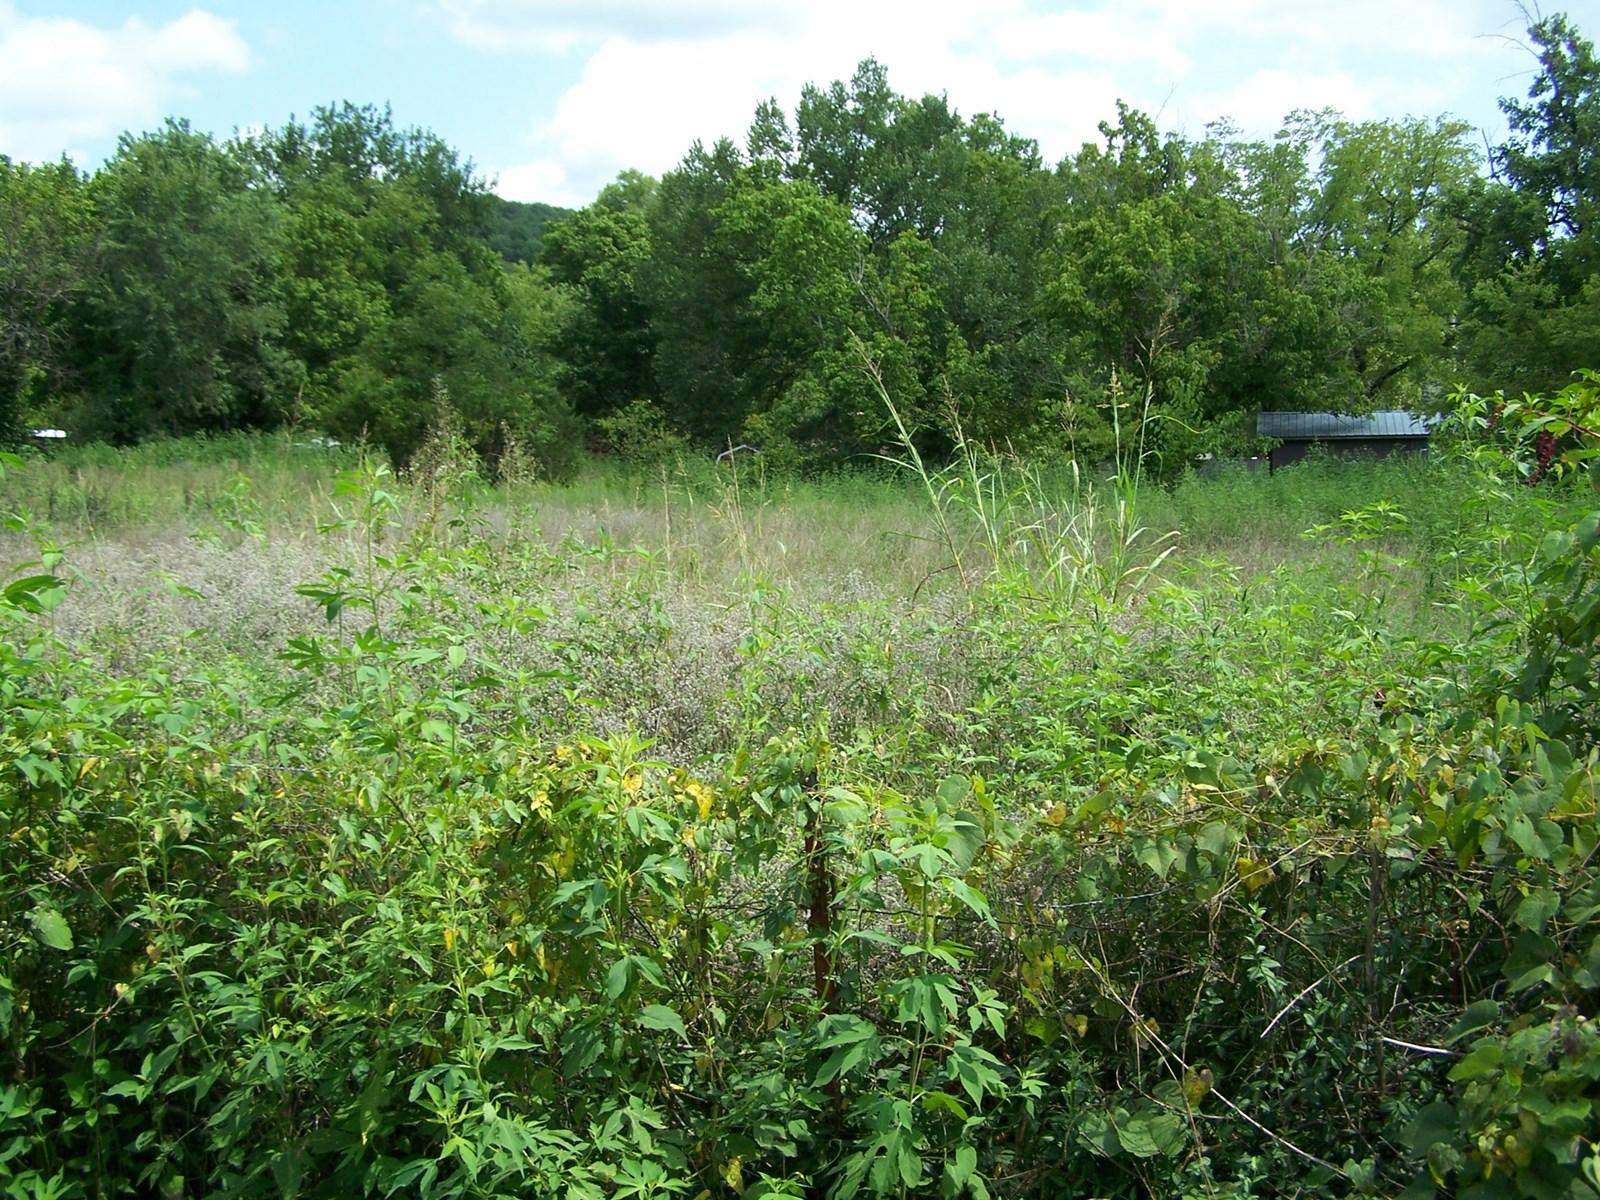 3 lots For Sale Inside City Limits of Leslie, Arkansas